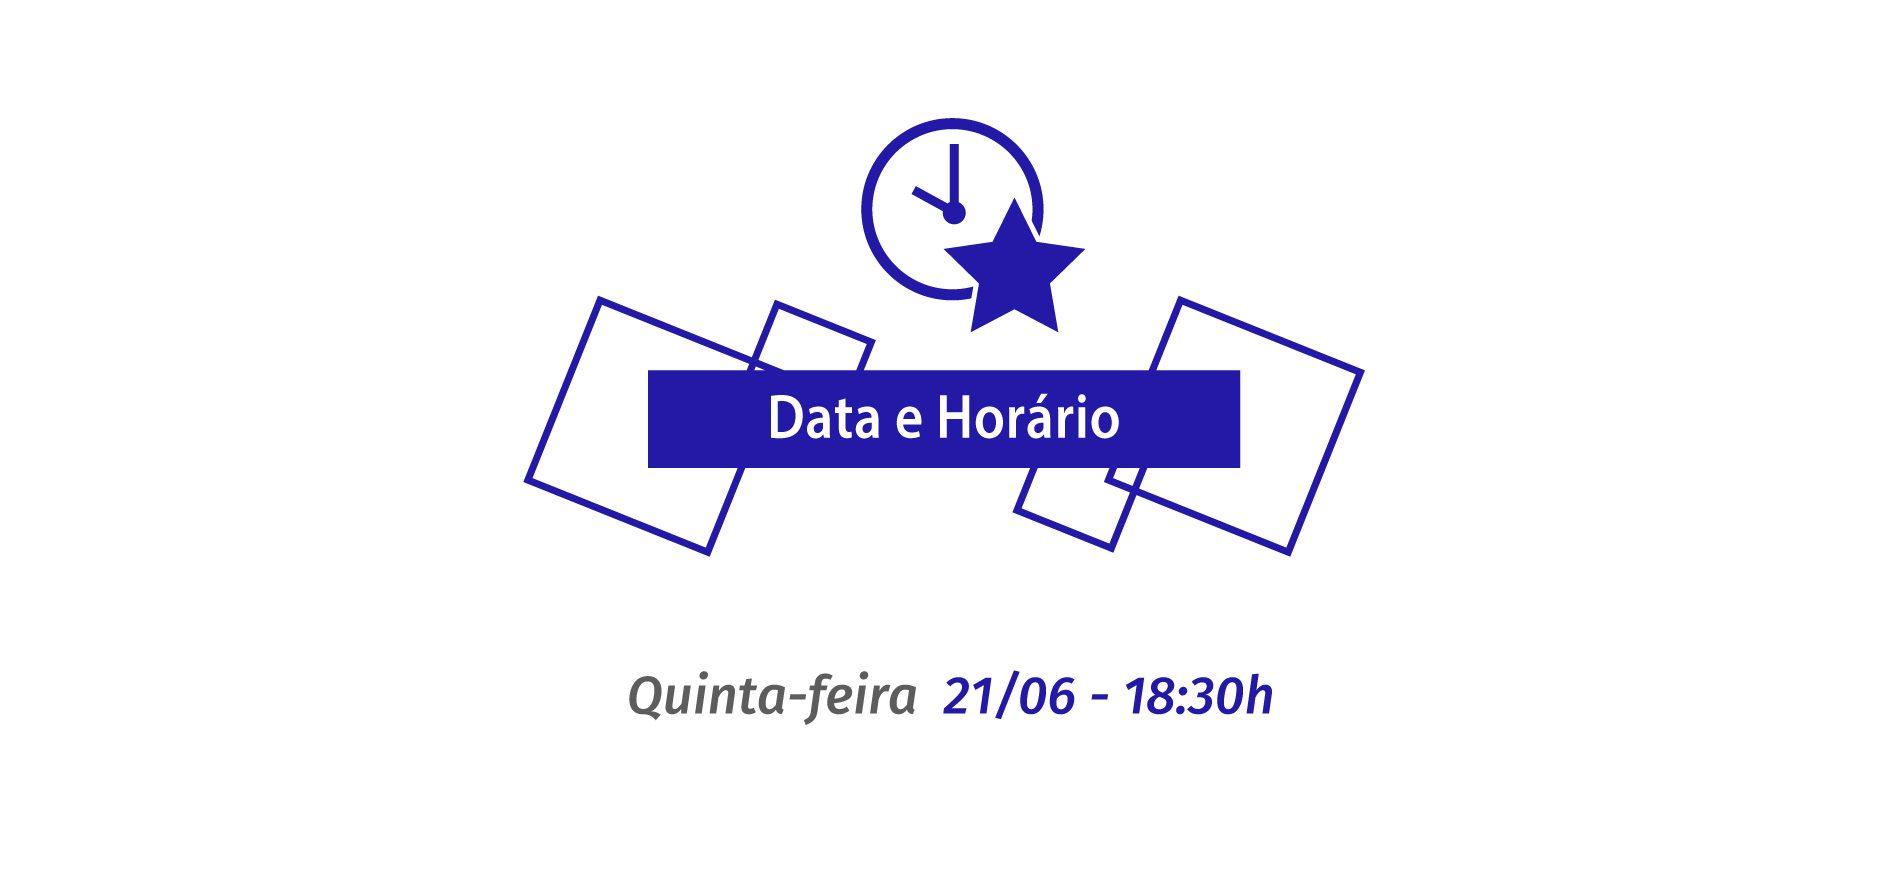 https://www.mestregp.com.br/wp-content/uploads/2018/03/Pagina-PeP-DATA-1900x871.jpg